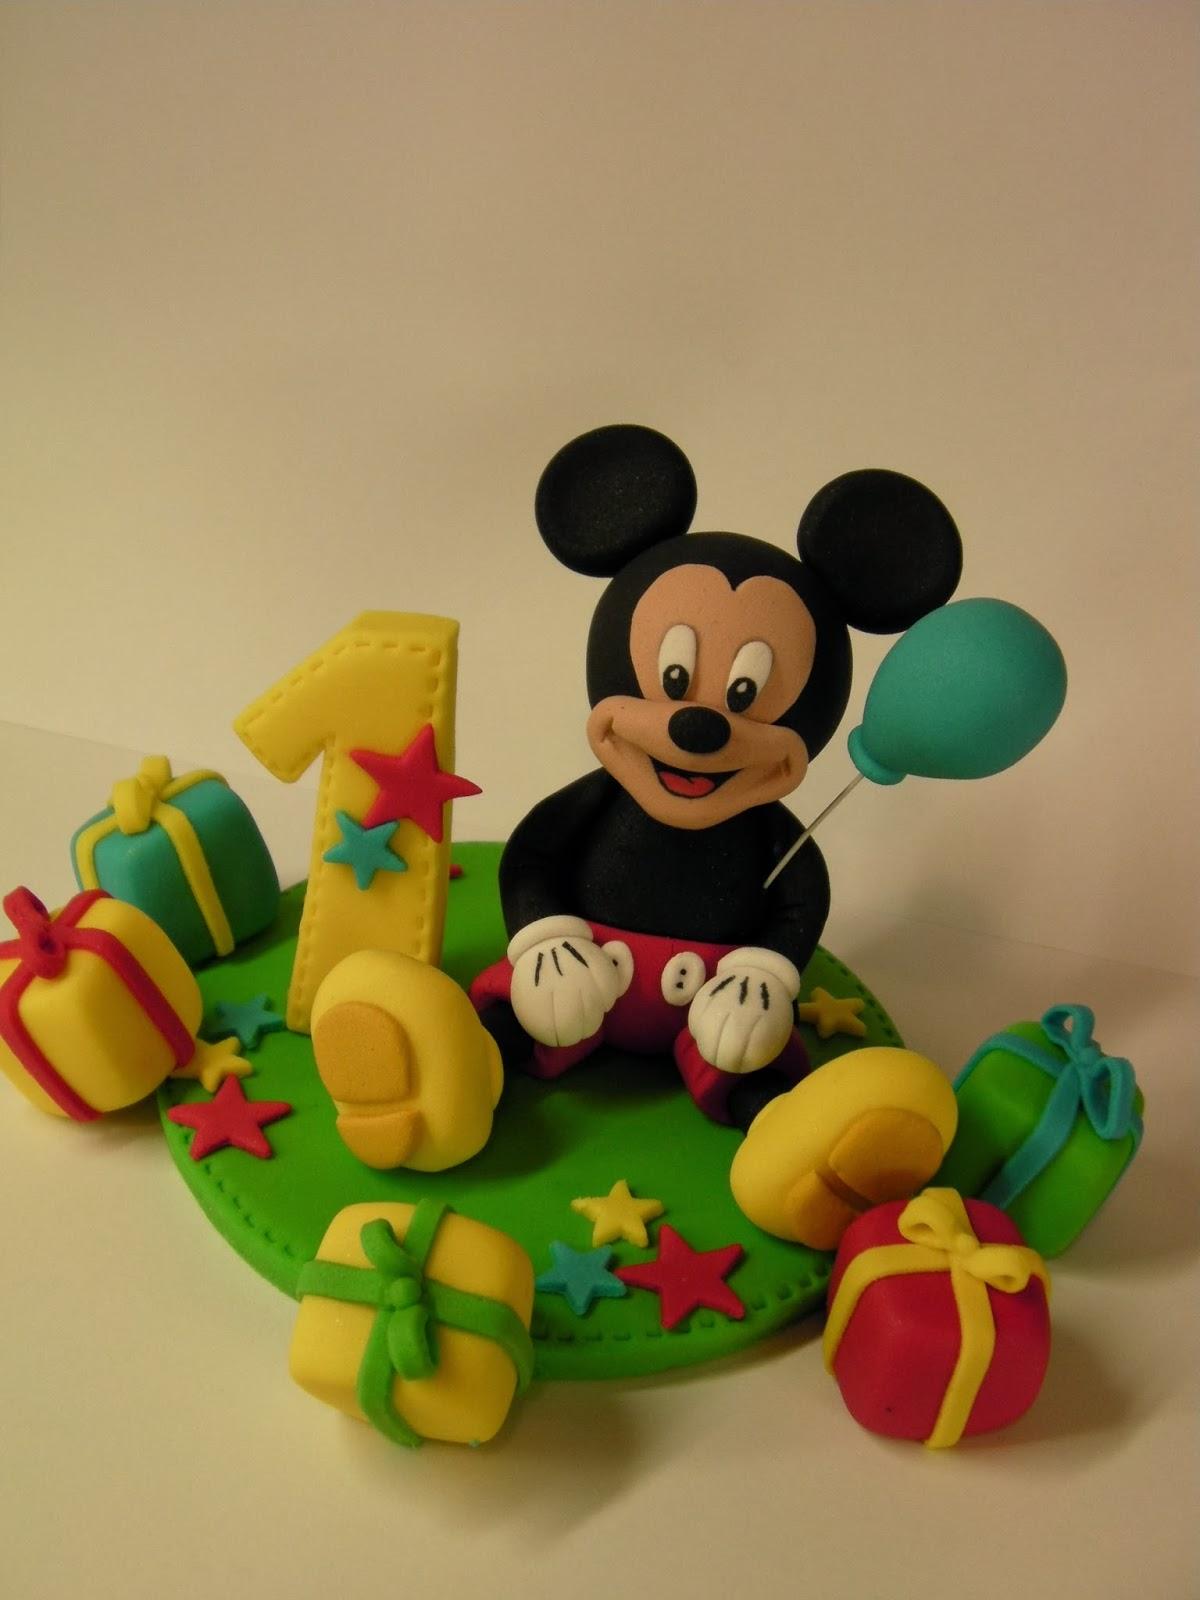 studio fondant design ana figurice za torte fondant. Black Bedroom Furniture Sets. Home Design Ideas